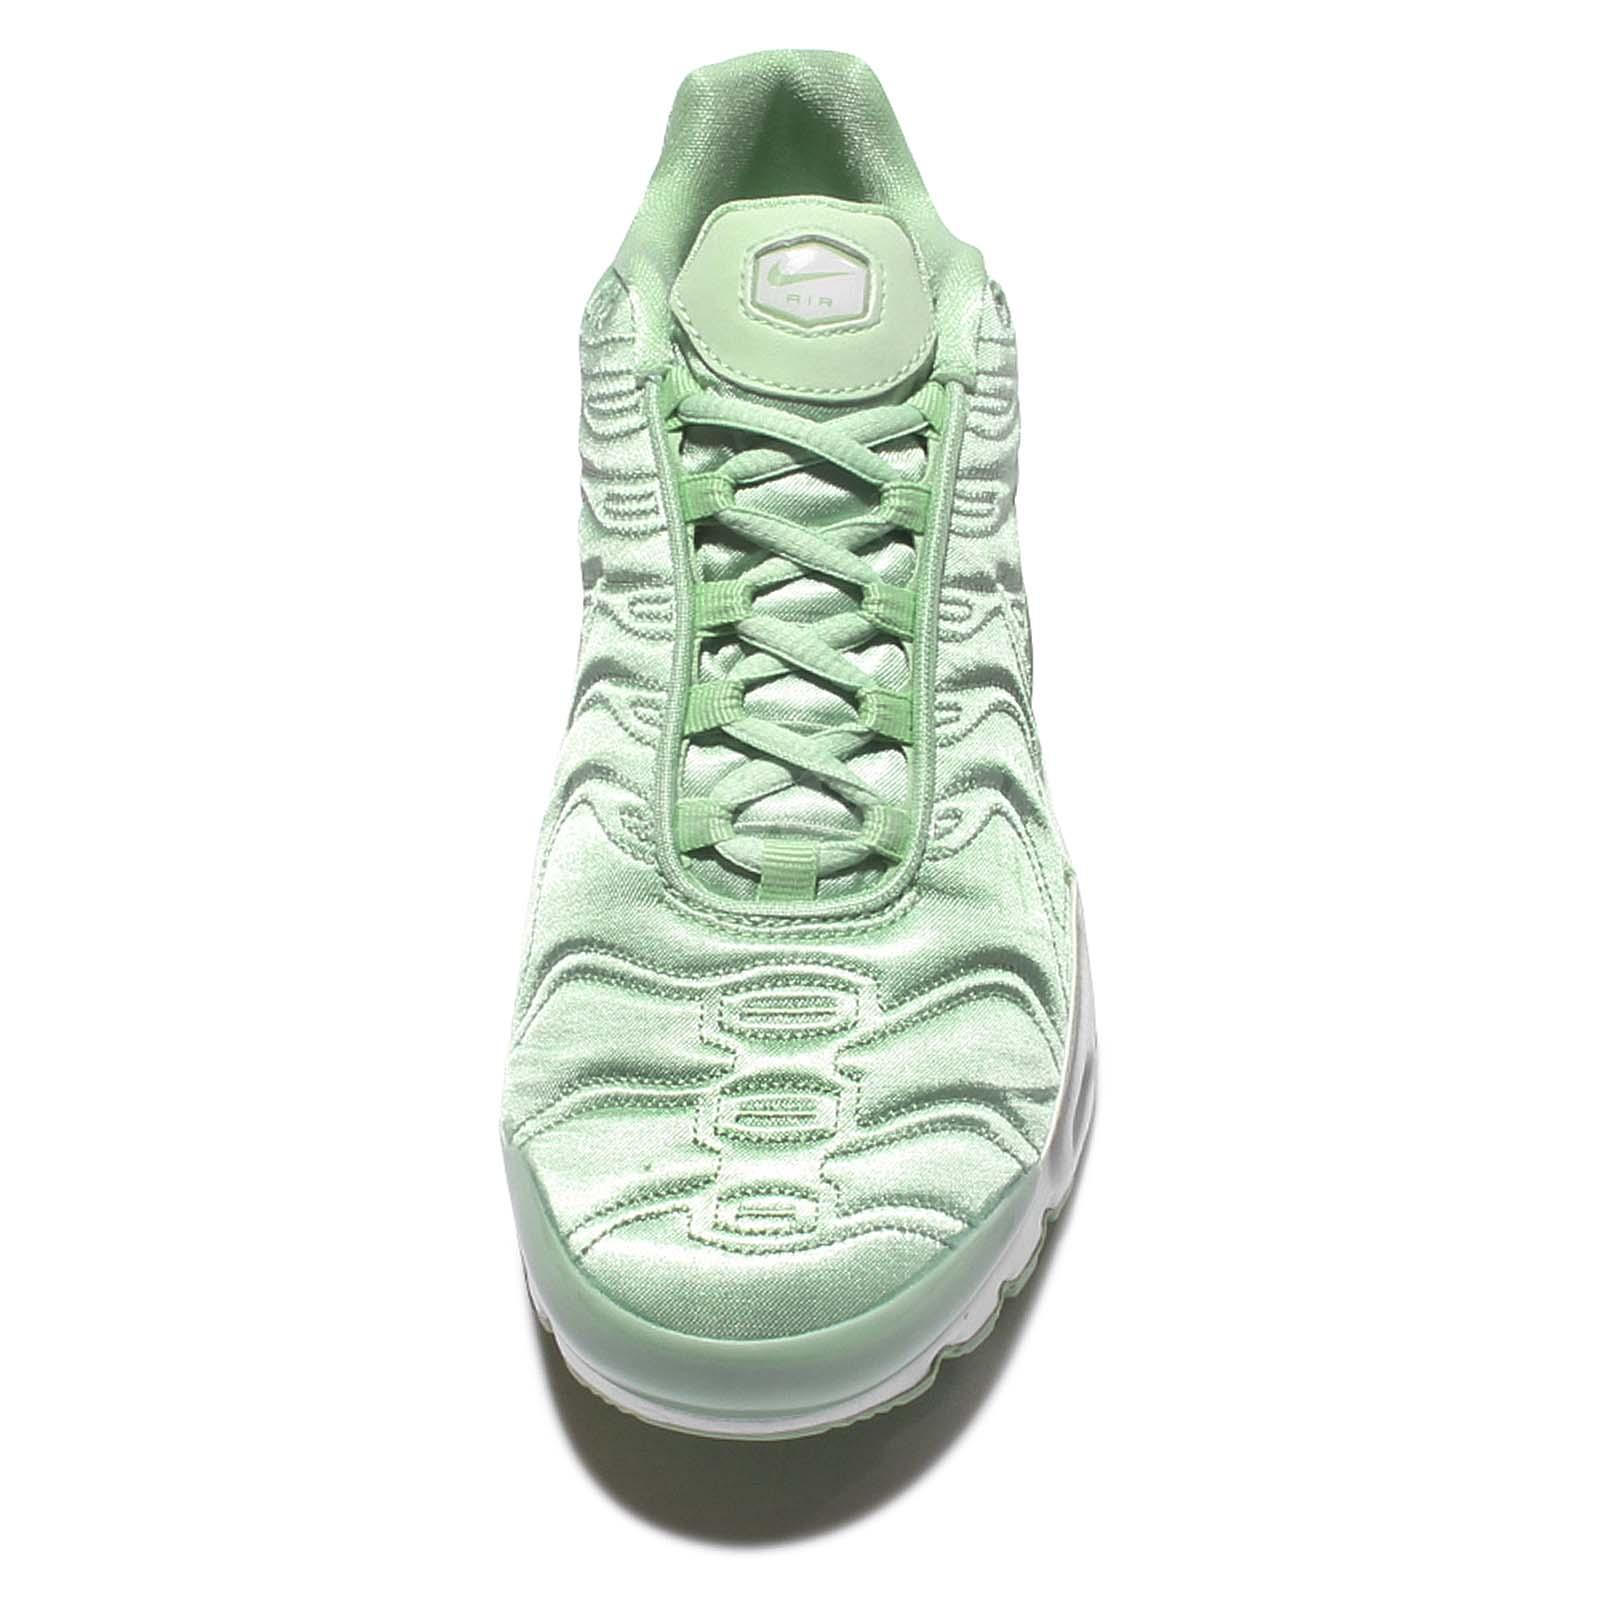 Women's Nike Air Max Plus Tn Ultra Enamel Green White 830768